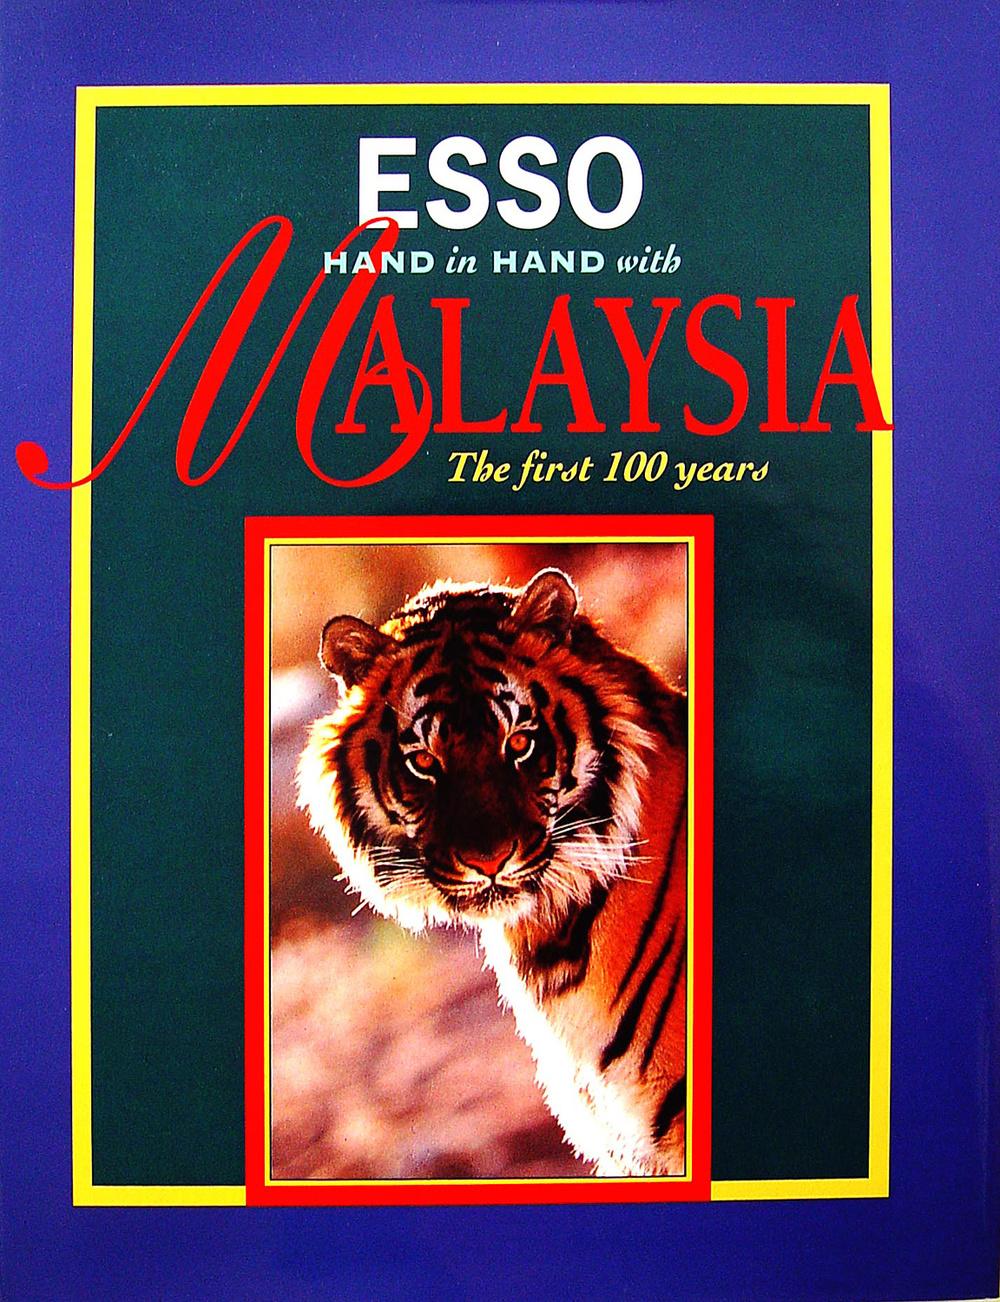 Esso-Malaysia.jpg